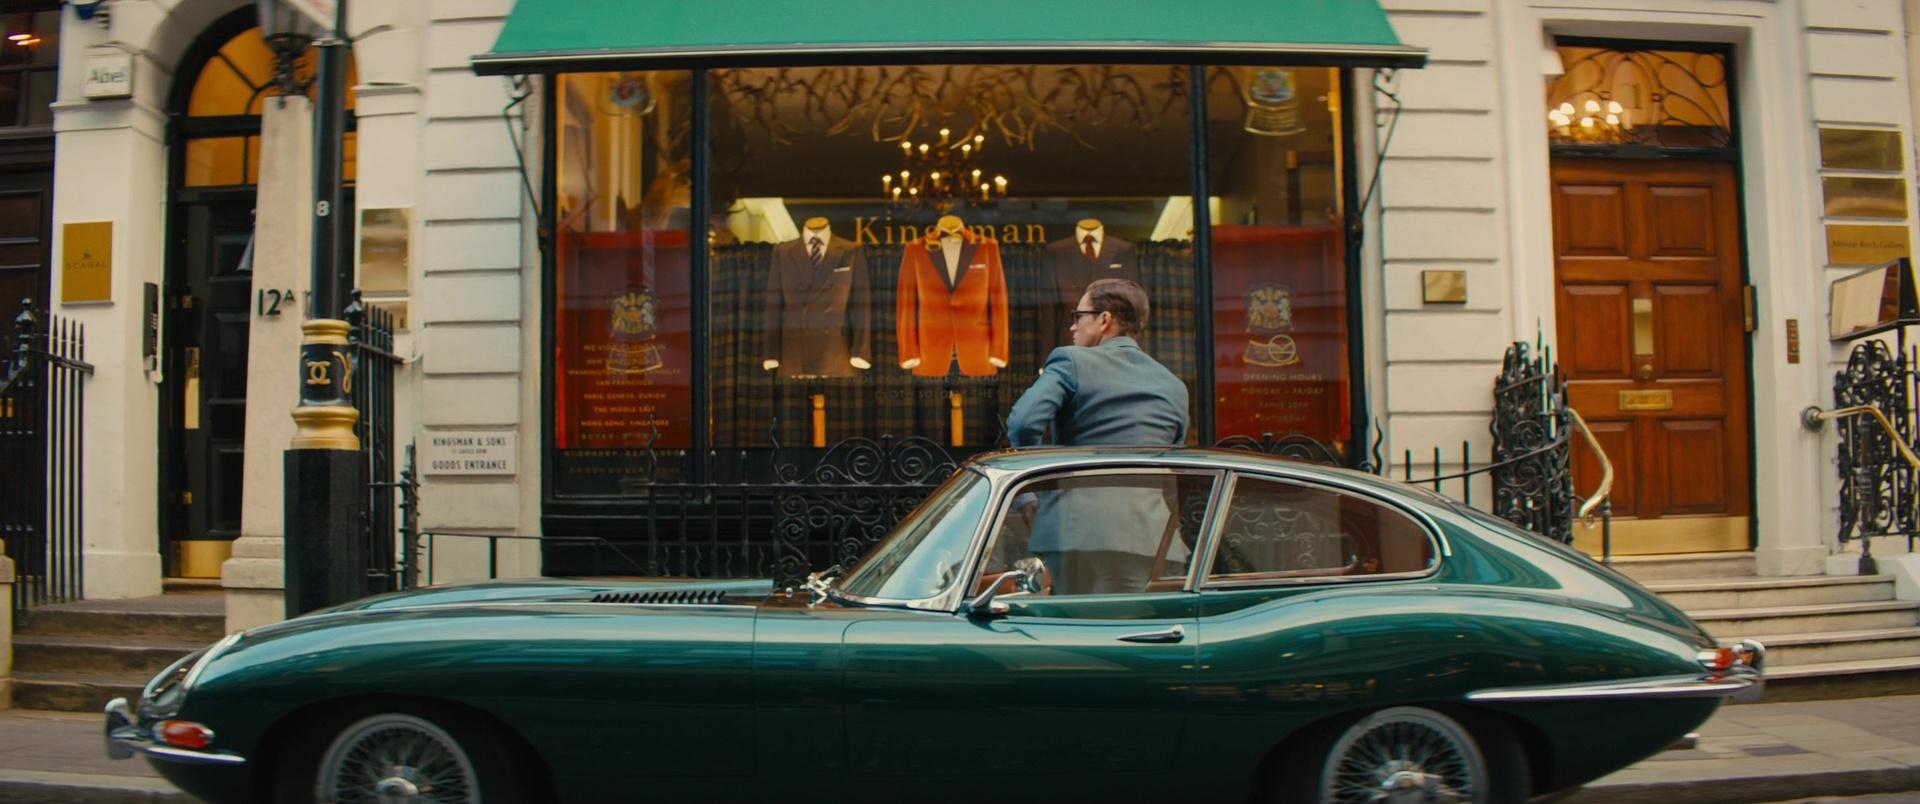 Capital Car Shows >> Jaguar E-Type (1964) Retro Car Used by Taron Egerton in Kingsman 2: The Golden Circle (2017) Movie